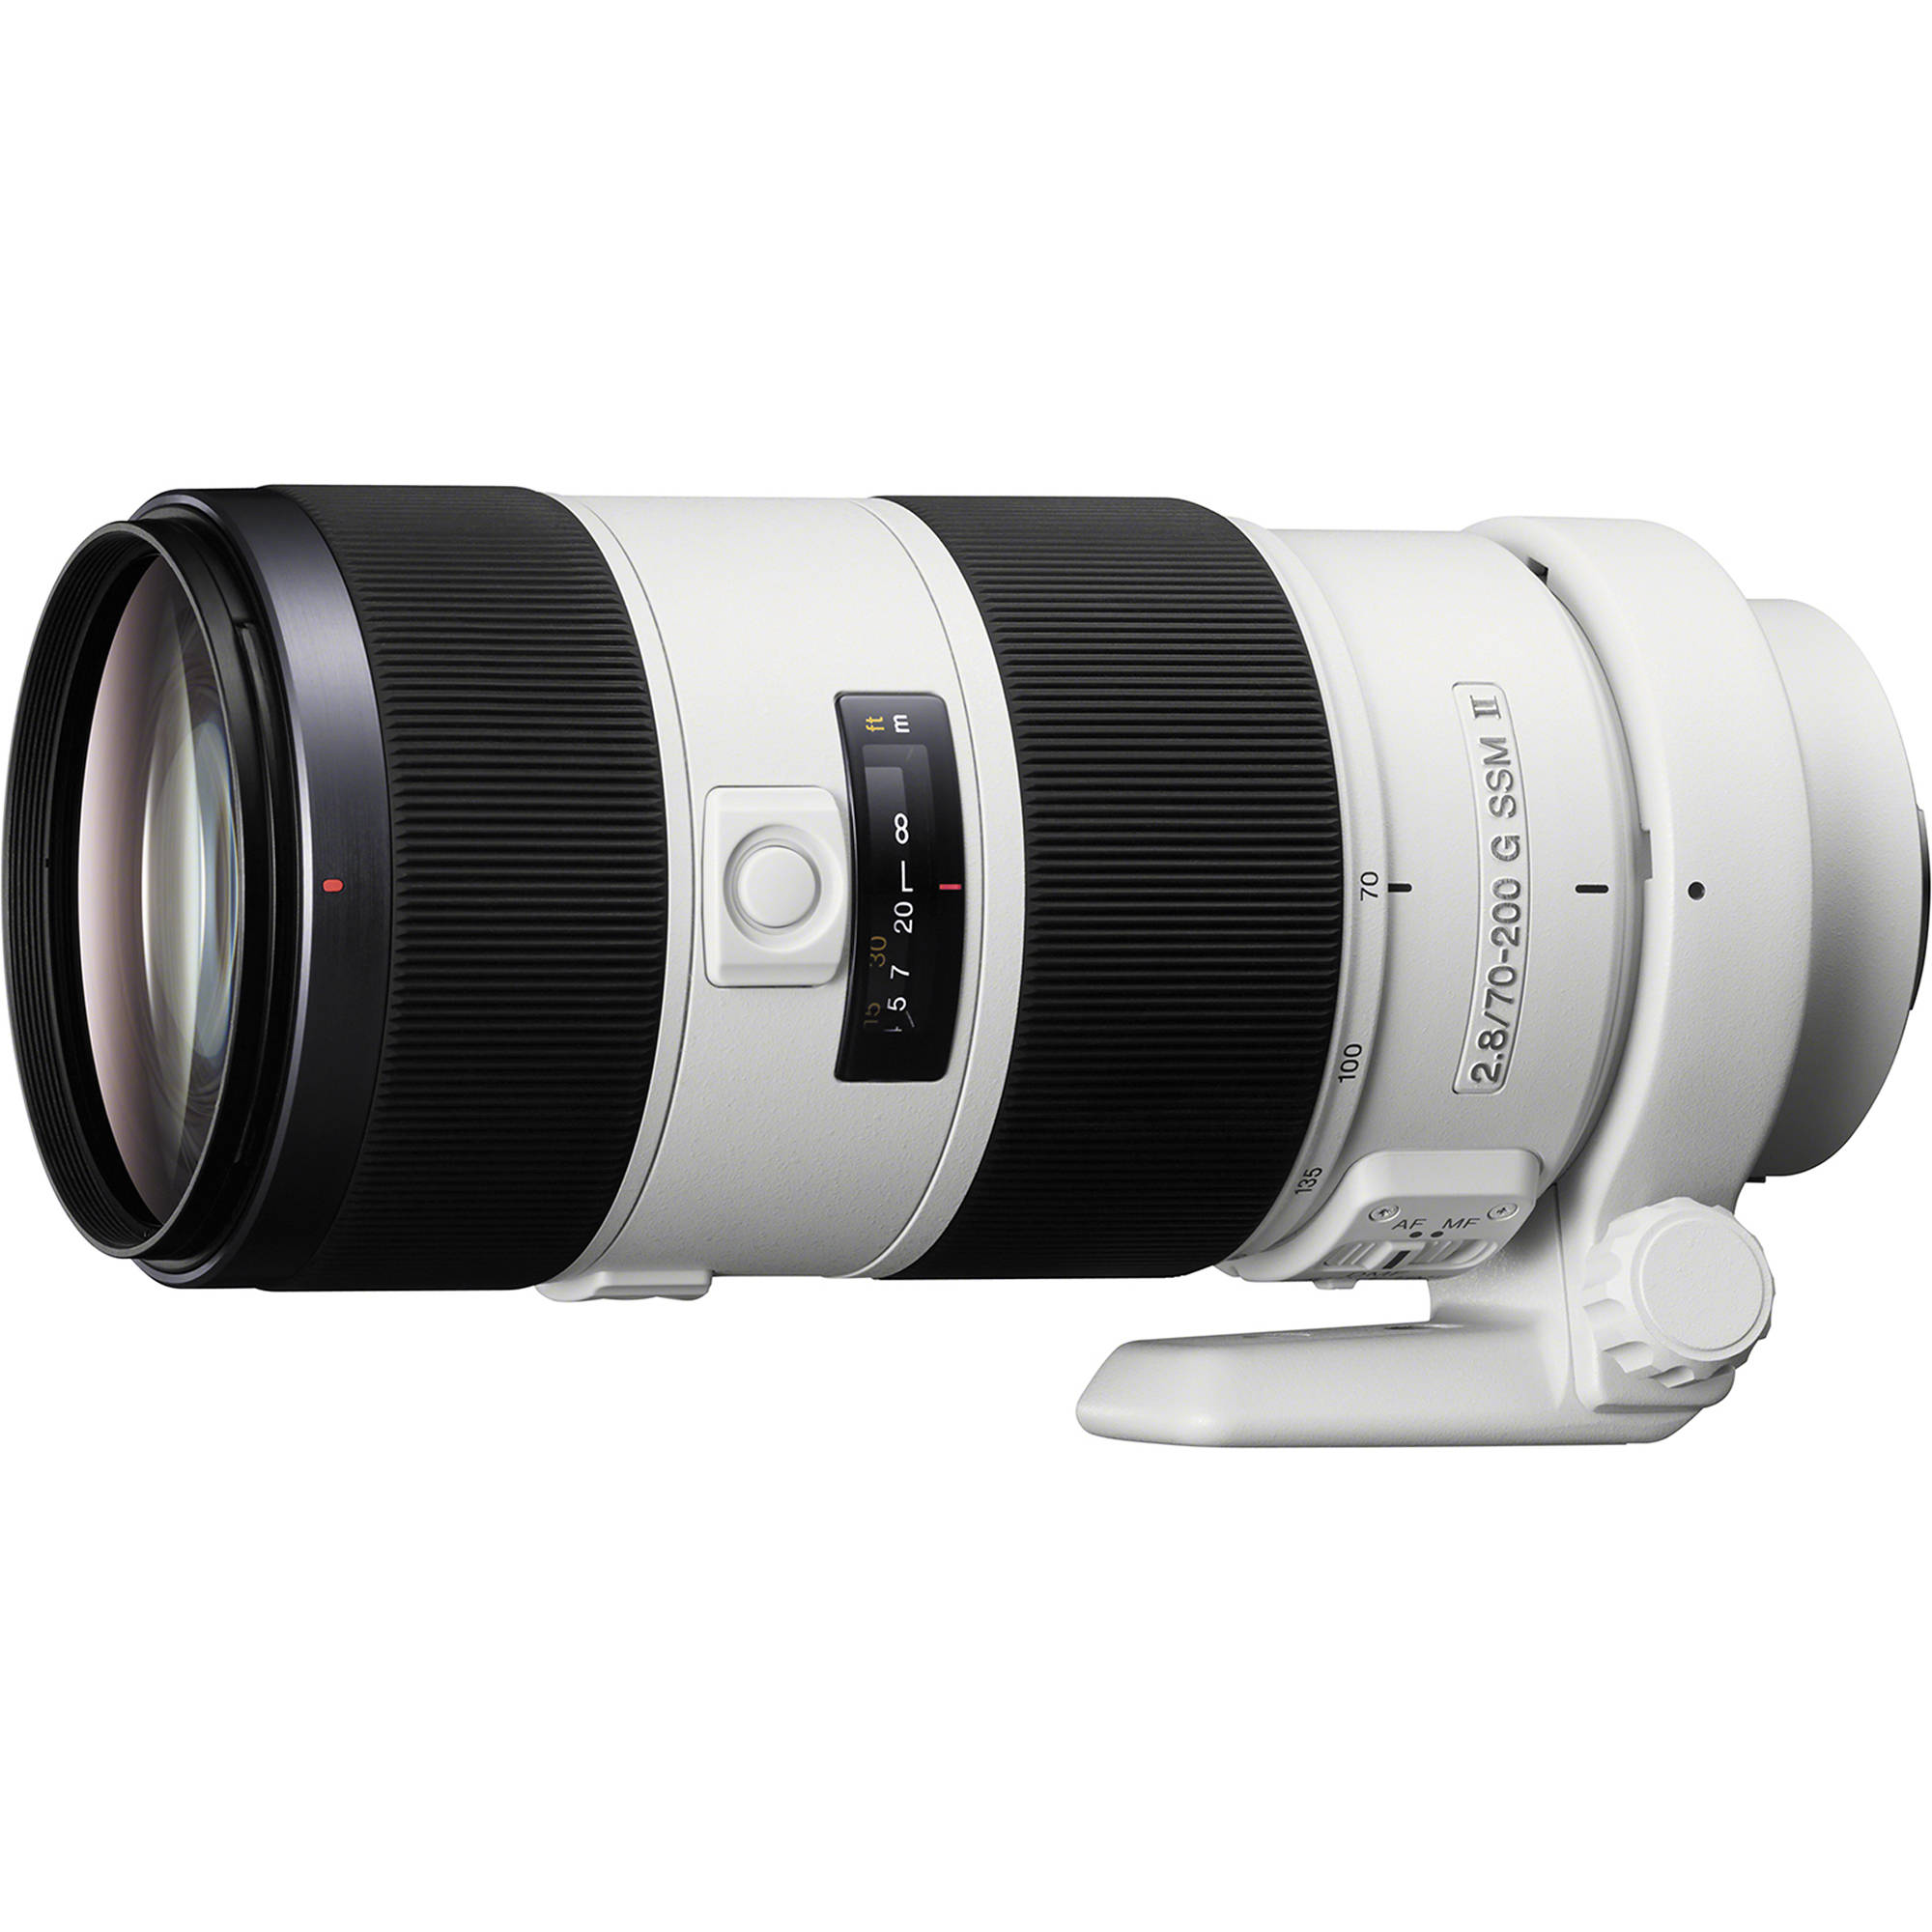 sony 70 200 f4. sony 70-200mm f/2.8 g ssm ii lens 70 200 f4